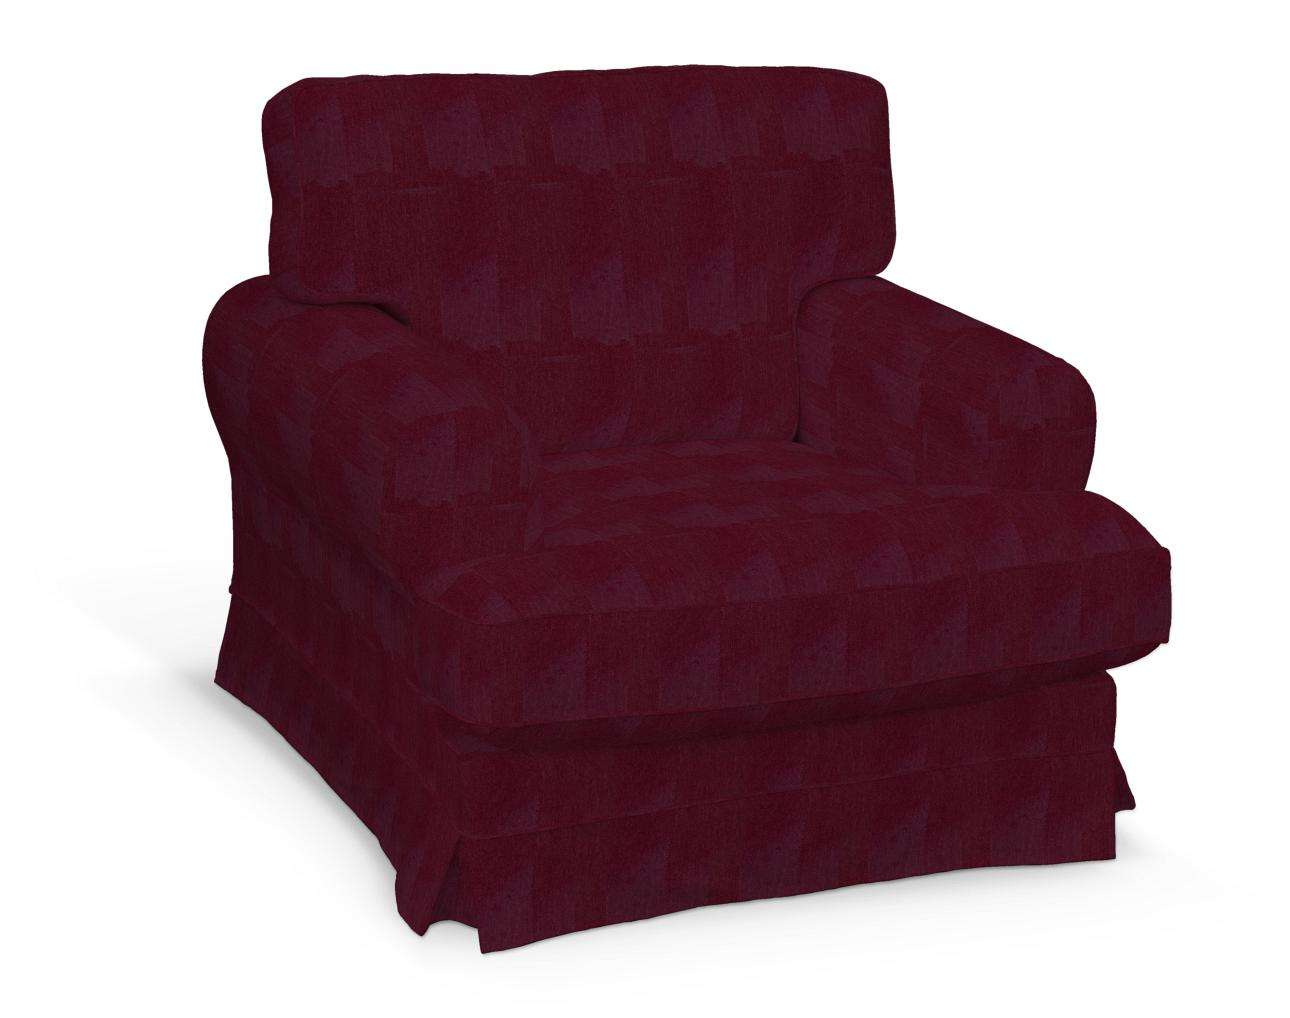 Pokrowiec na fotel Ekeskog Fotel Ekeskog w kolekcji Chenille, tkanina: 702-19